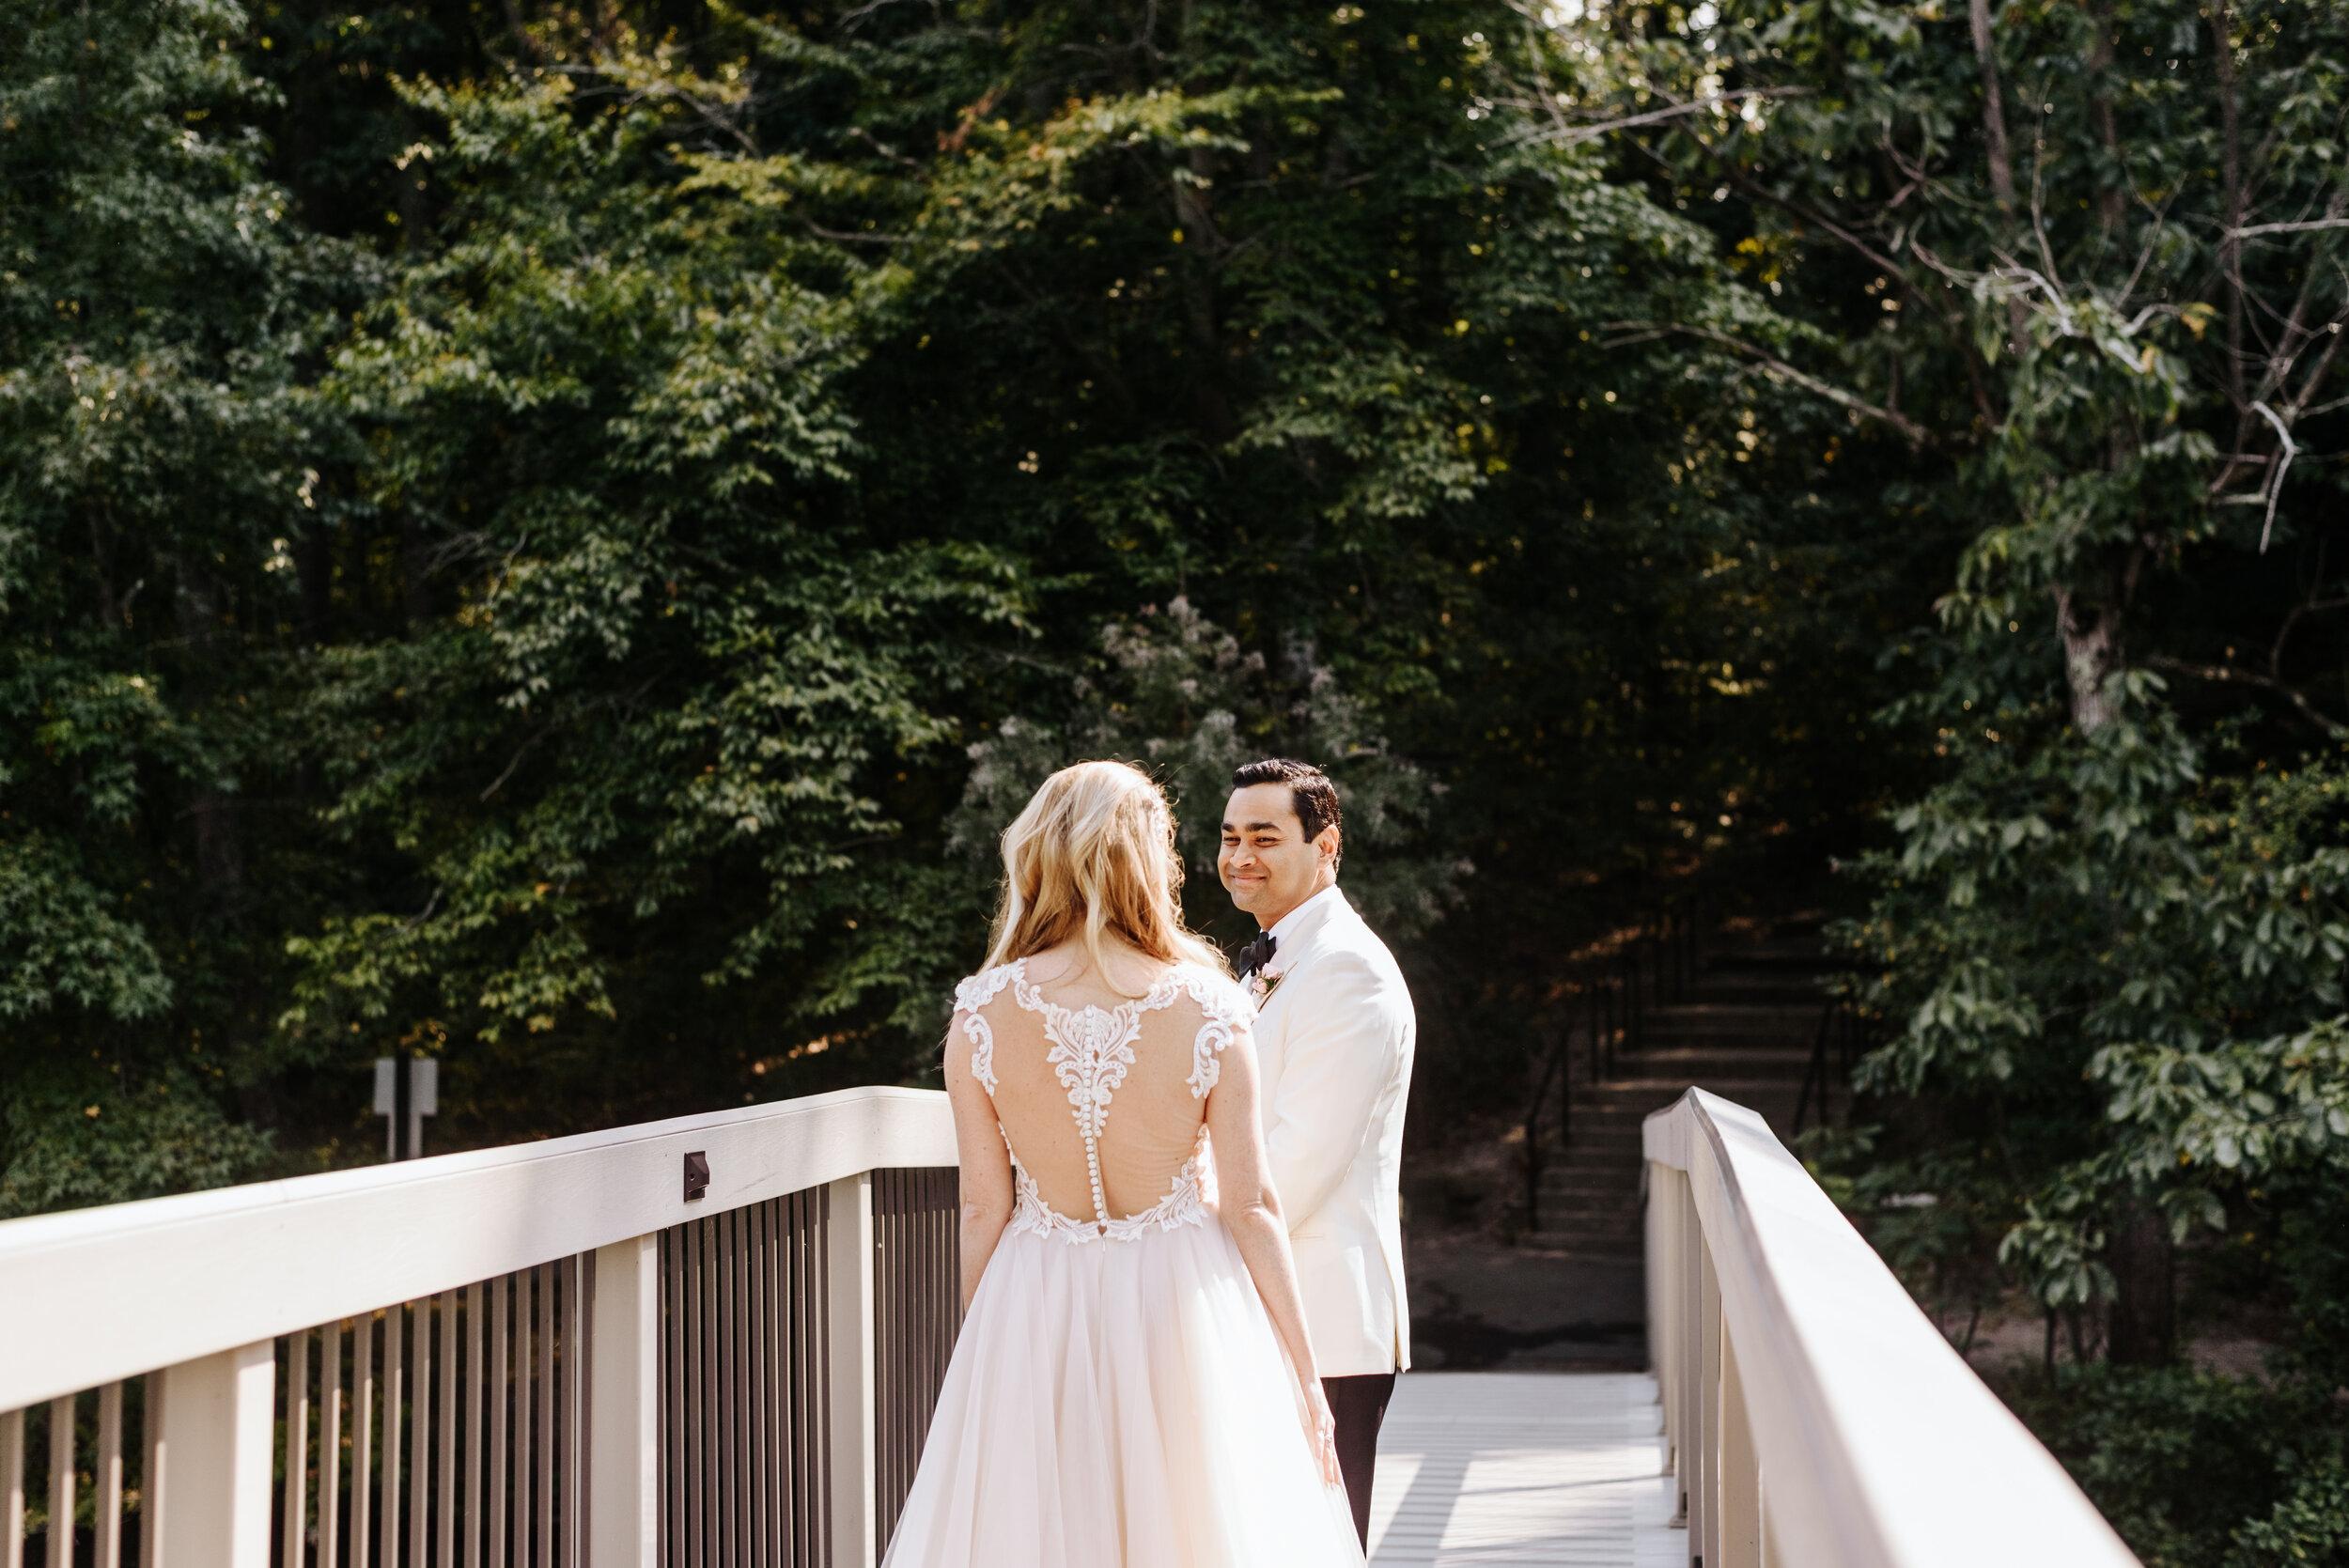 Cassie-Mrunal-Wedding-Quirk-Hotel-John-Marshall-Ballrooms-Richmond-Virginia-Photography-by-V-40.jpg